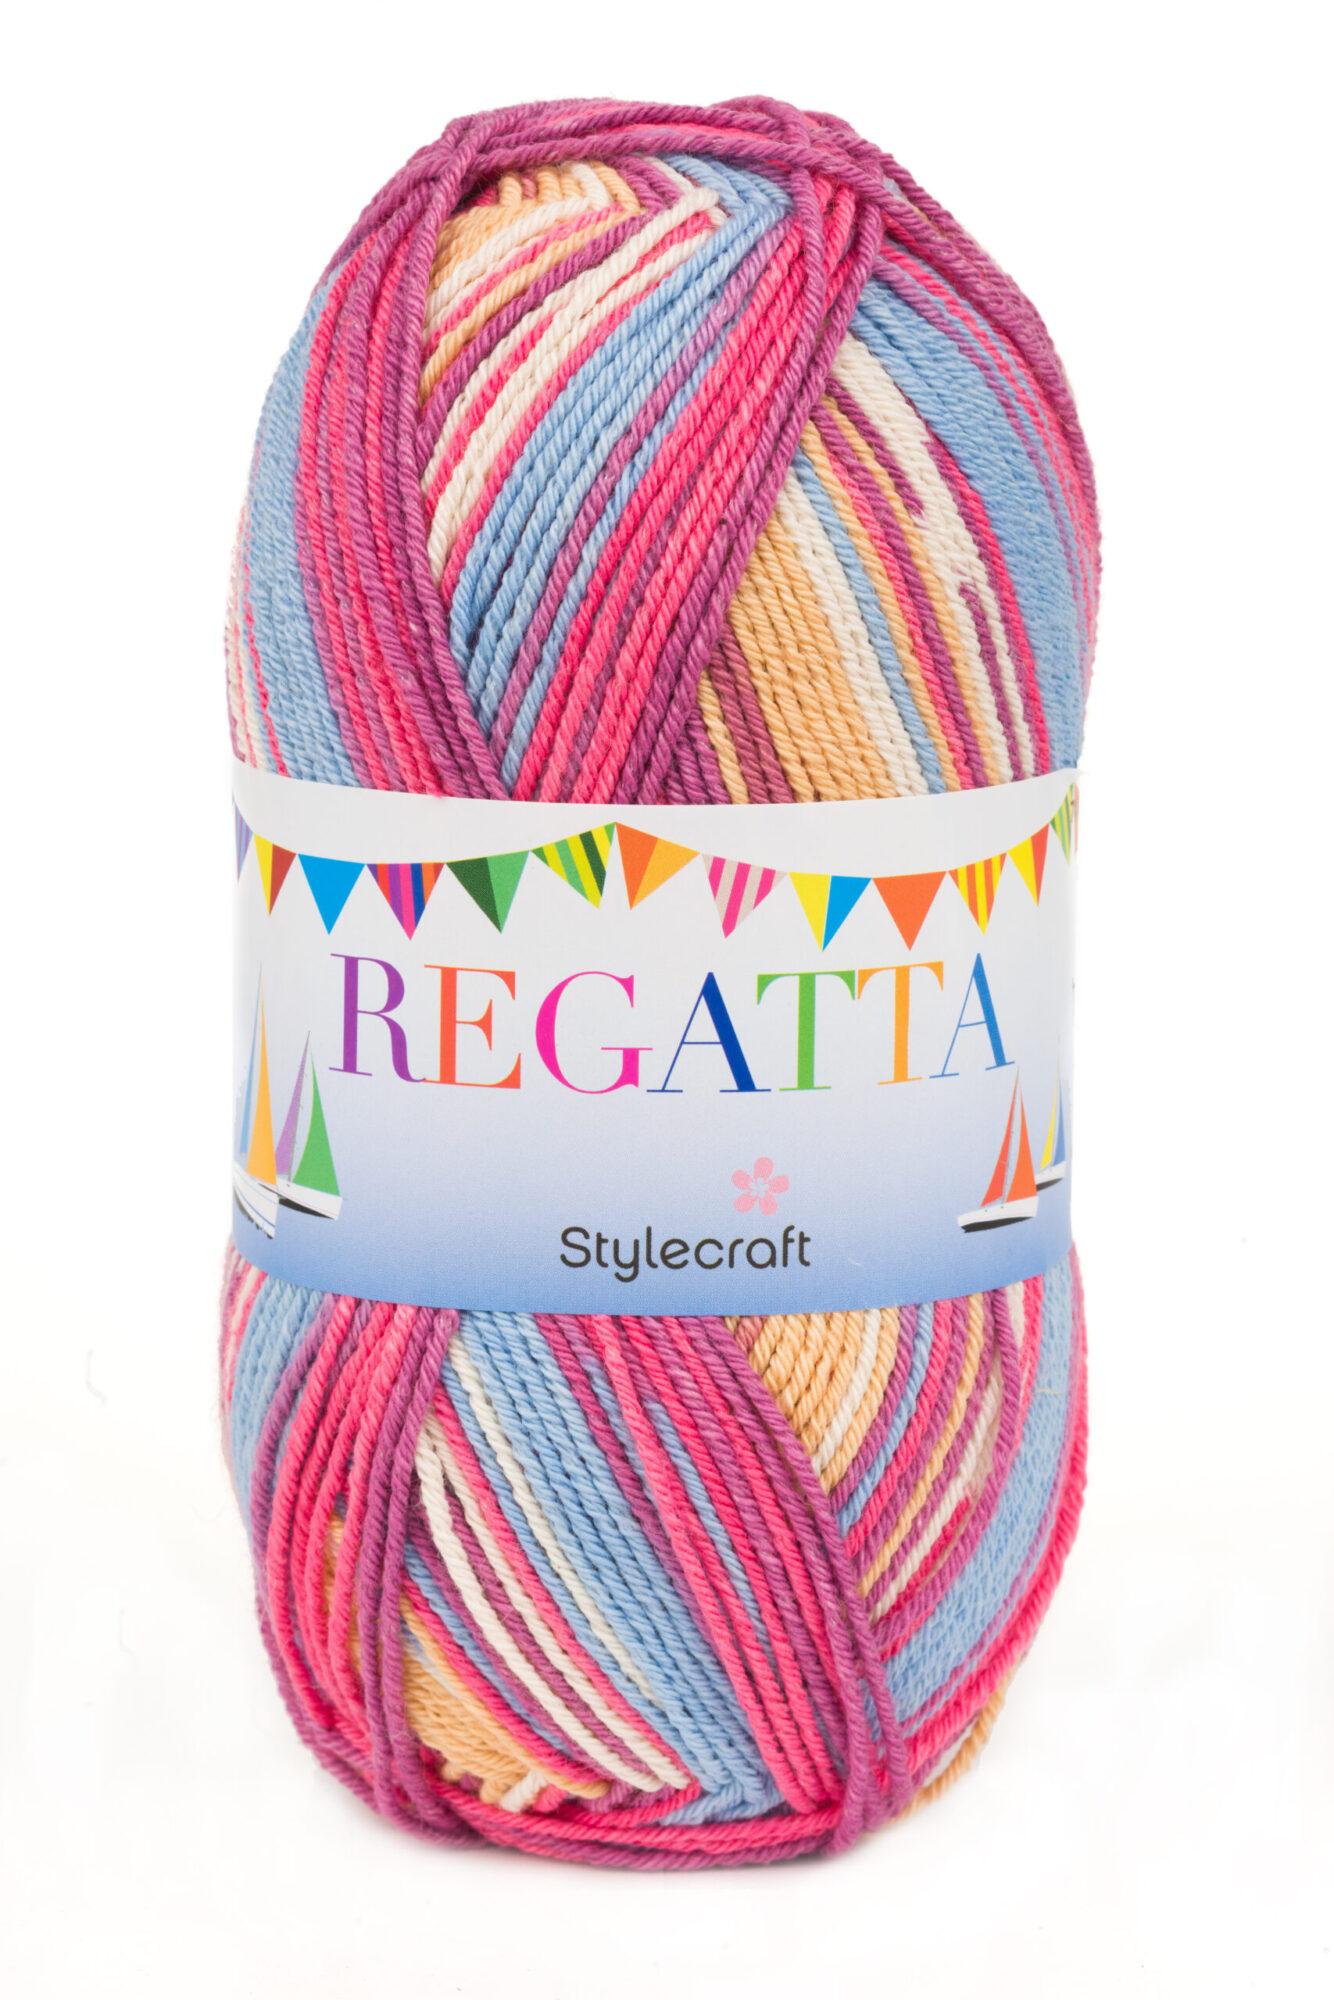 Stylecraft Regatta DK product image